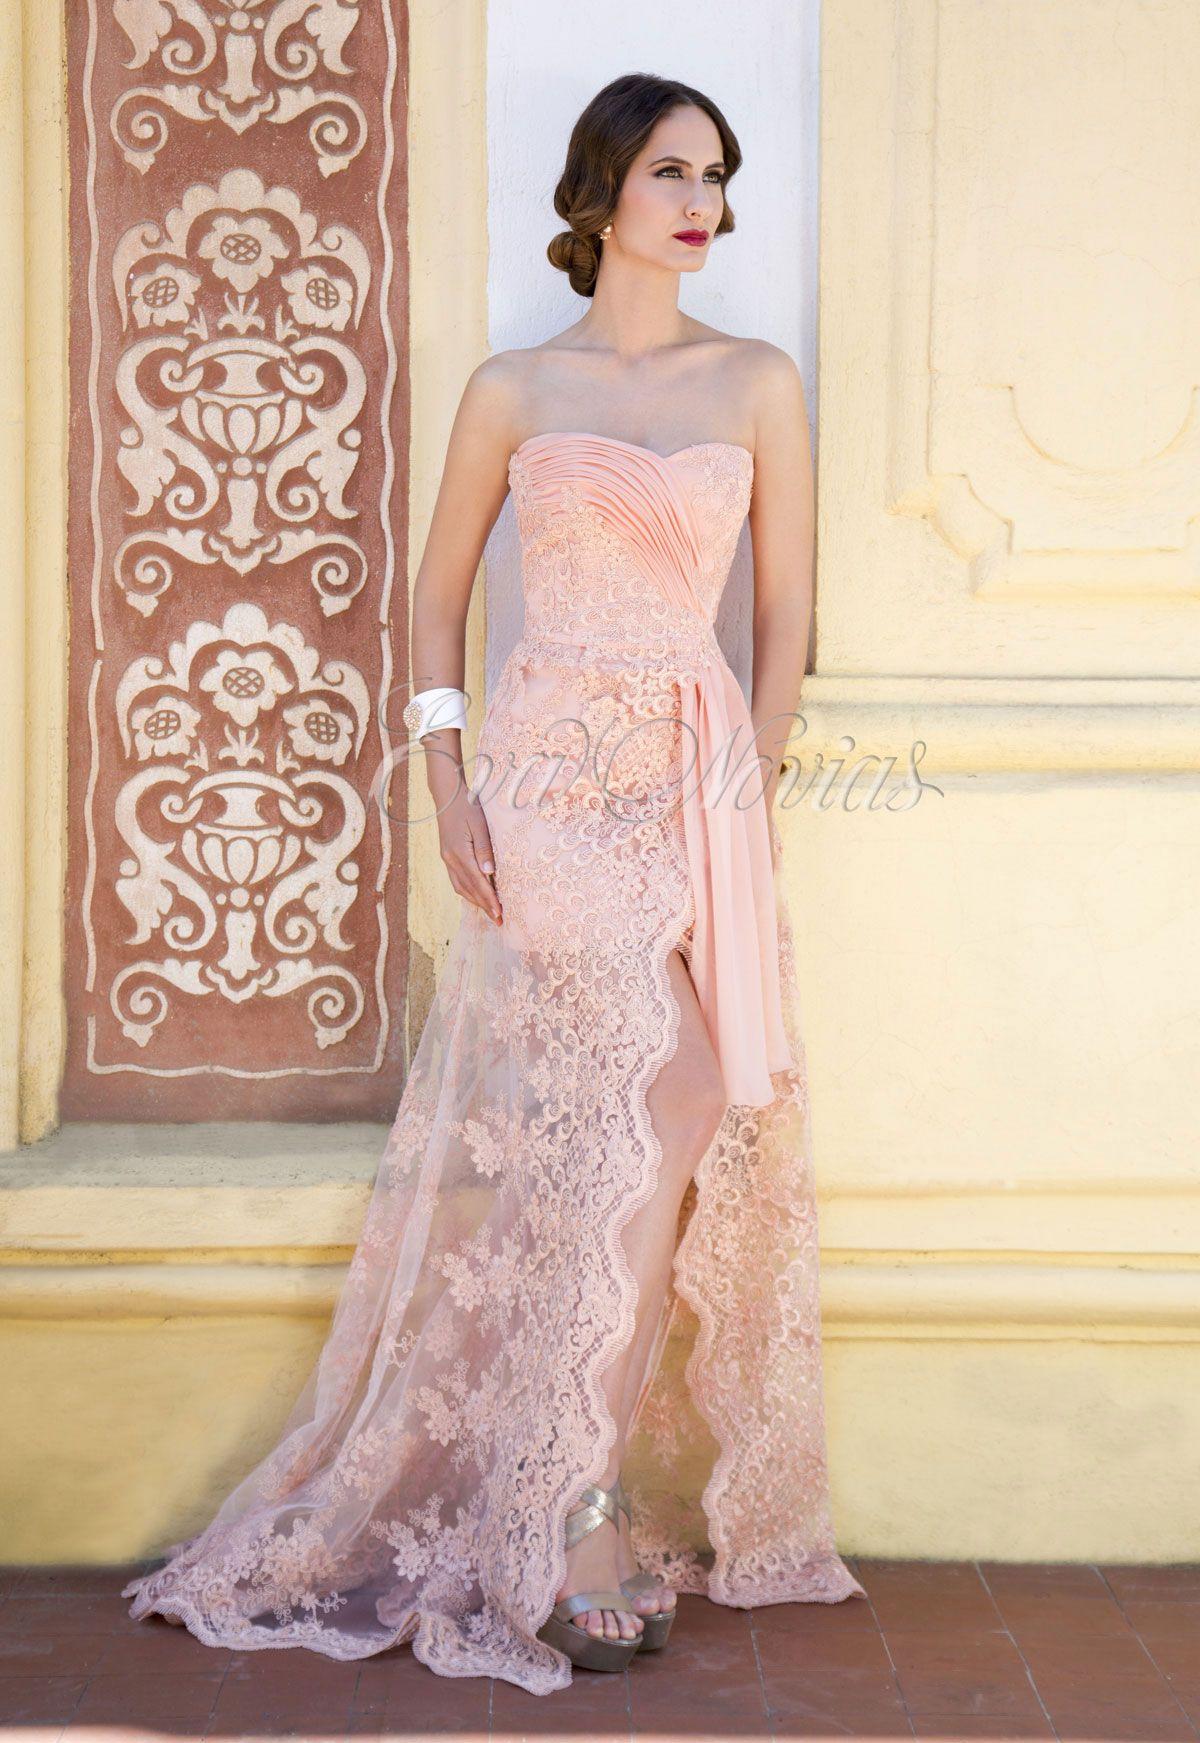 Vestido de fiesta Ana Torres 2016 Modelo 16025 en Eva Novias Madrid ...